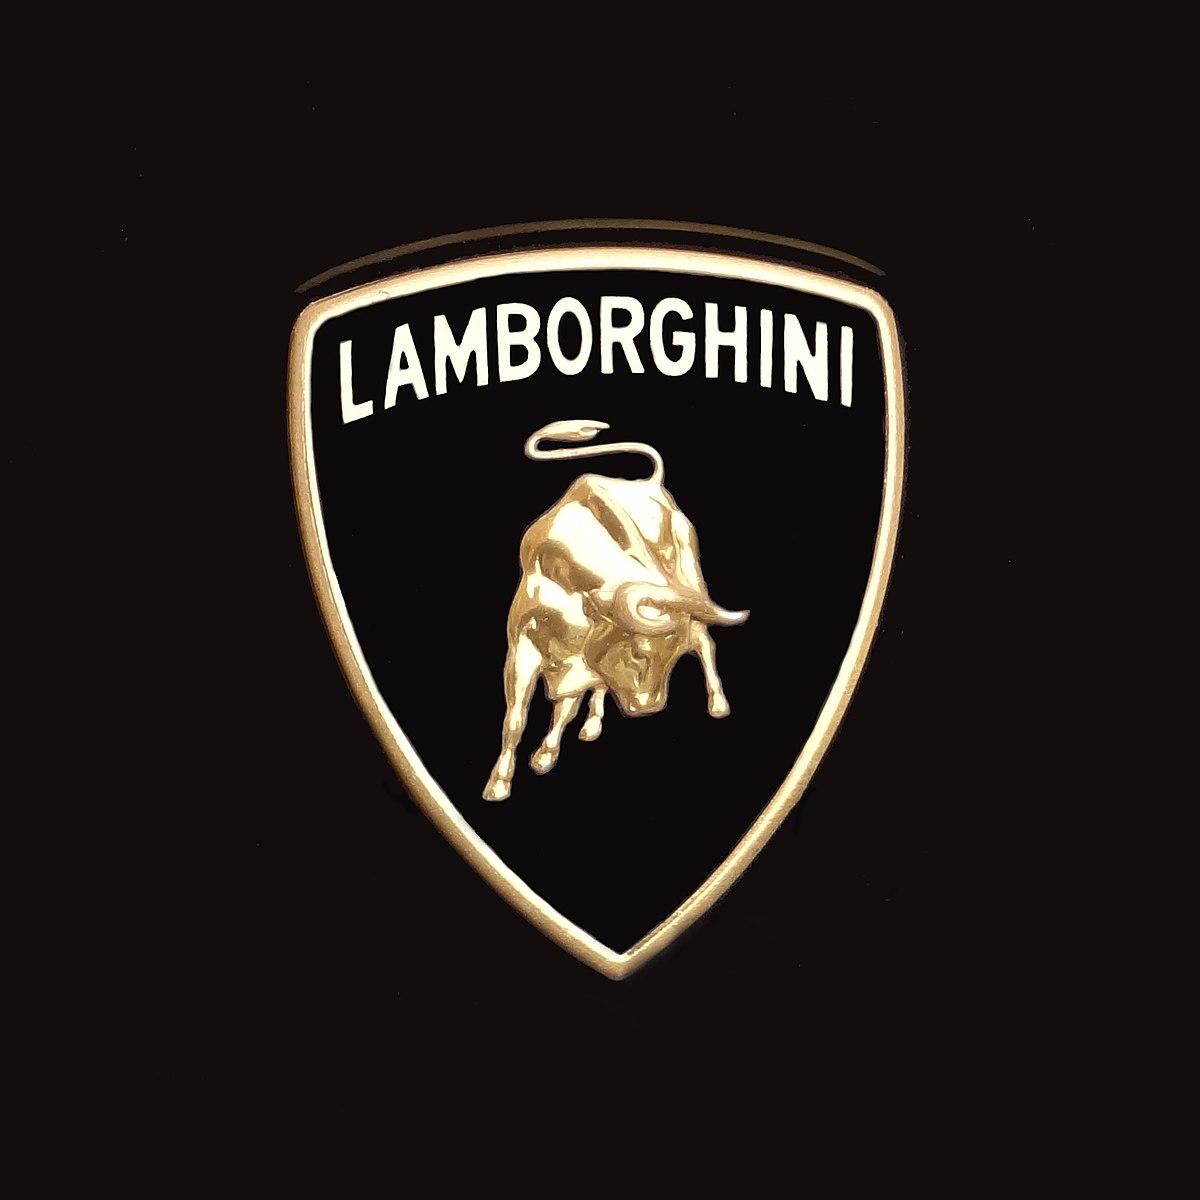 Lamborghini wikipedia la enciclopedia libre - Lamborghini symbol wallpaper ...